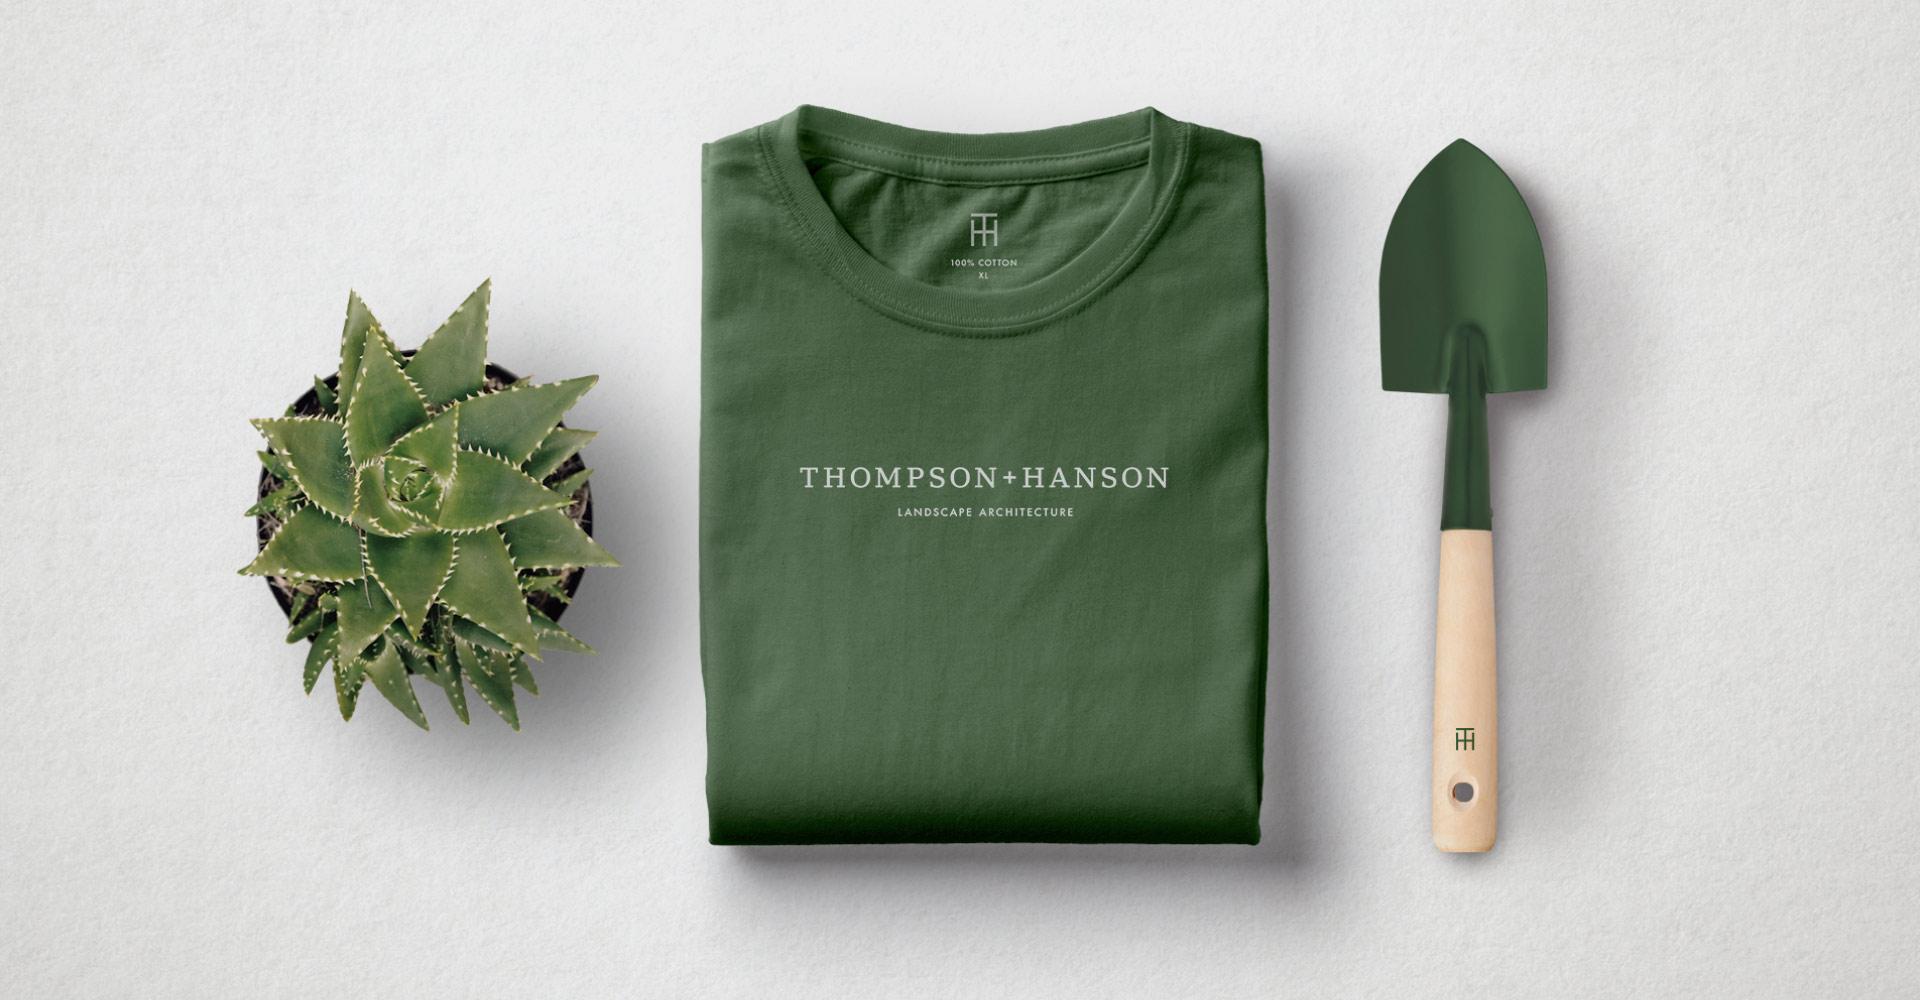 Creative_Retail_Packaging_Thompson_Hanson_Branding_4.jpg